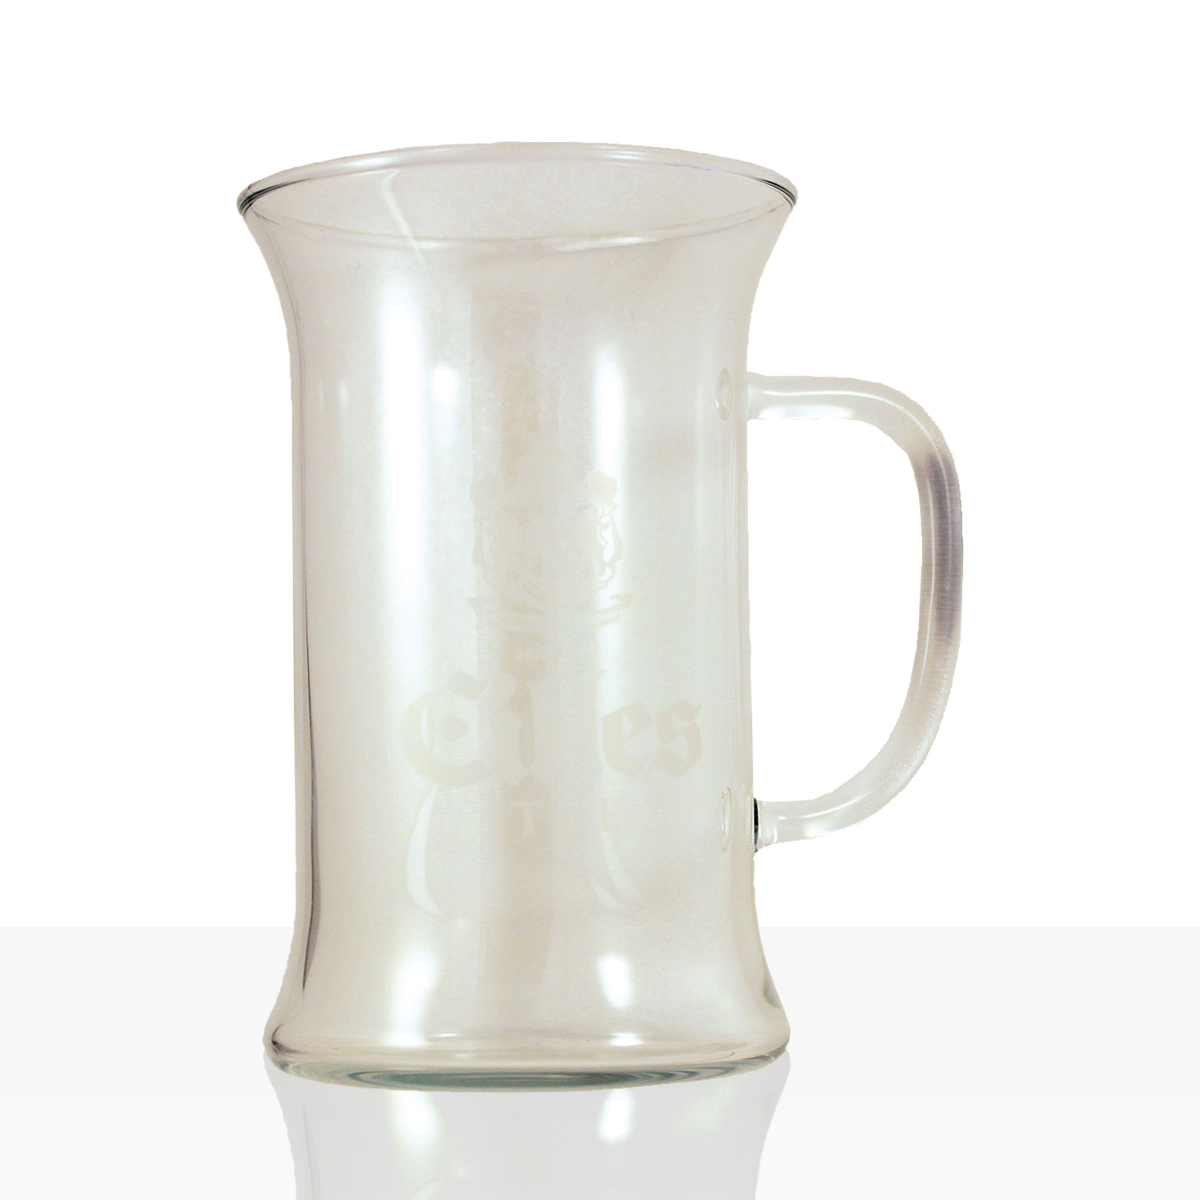 EILLES Teeglas dünnwandig, schickes Glas 1Stk